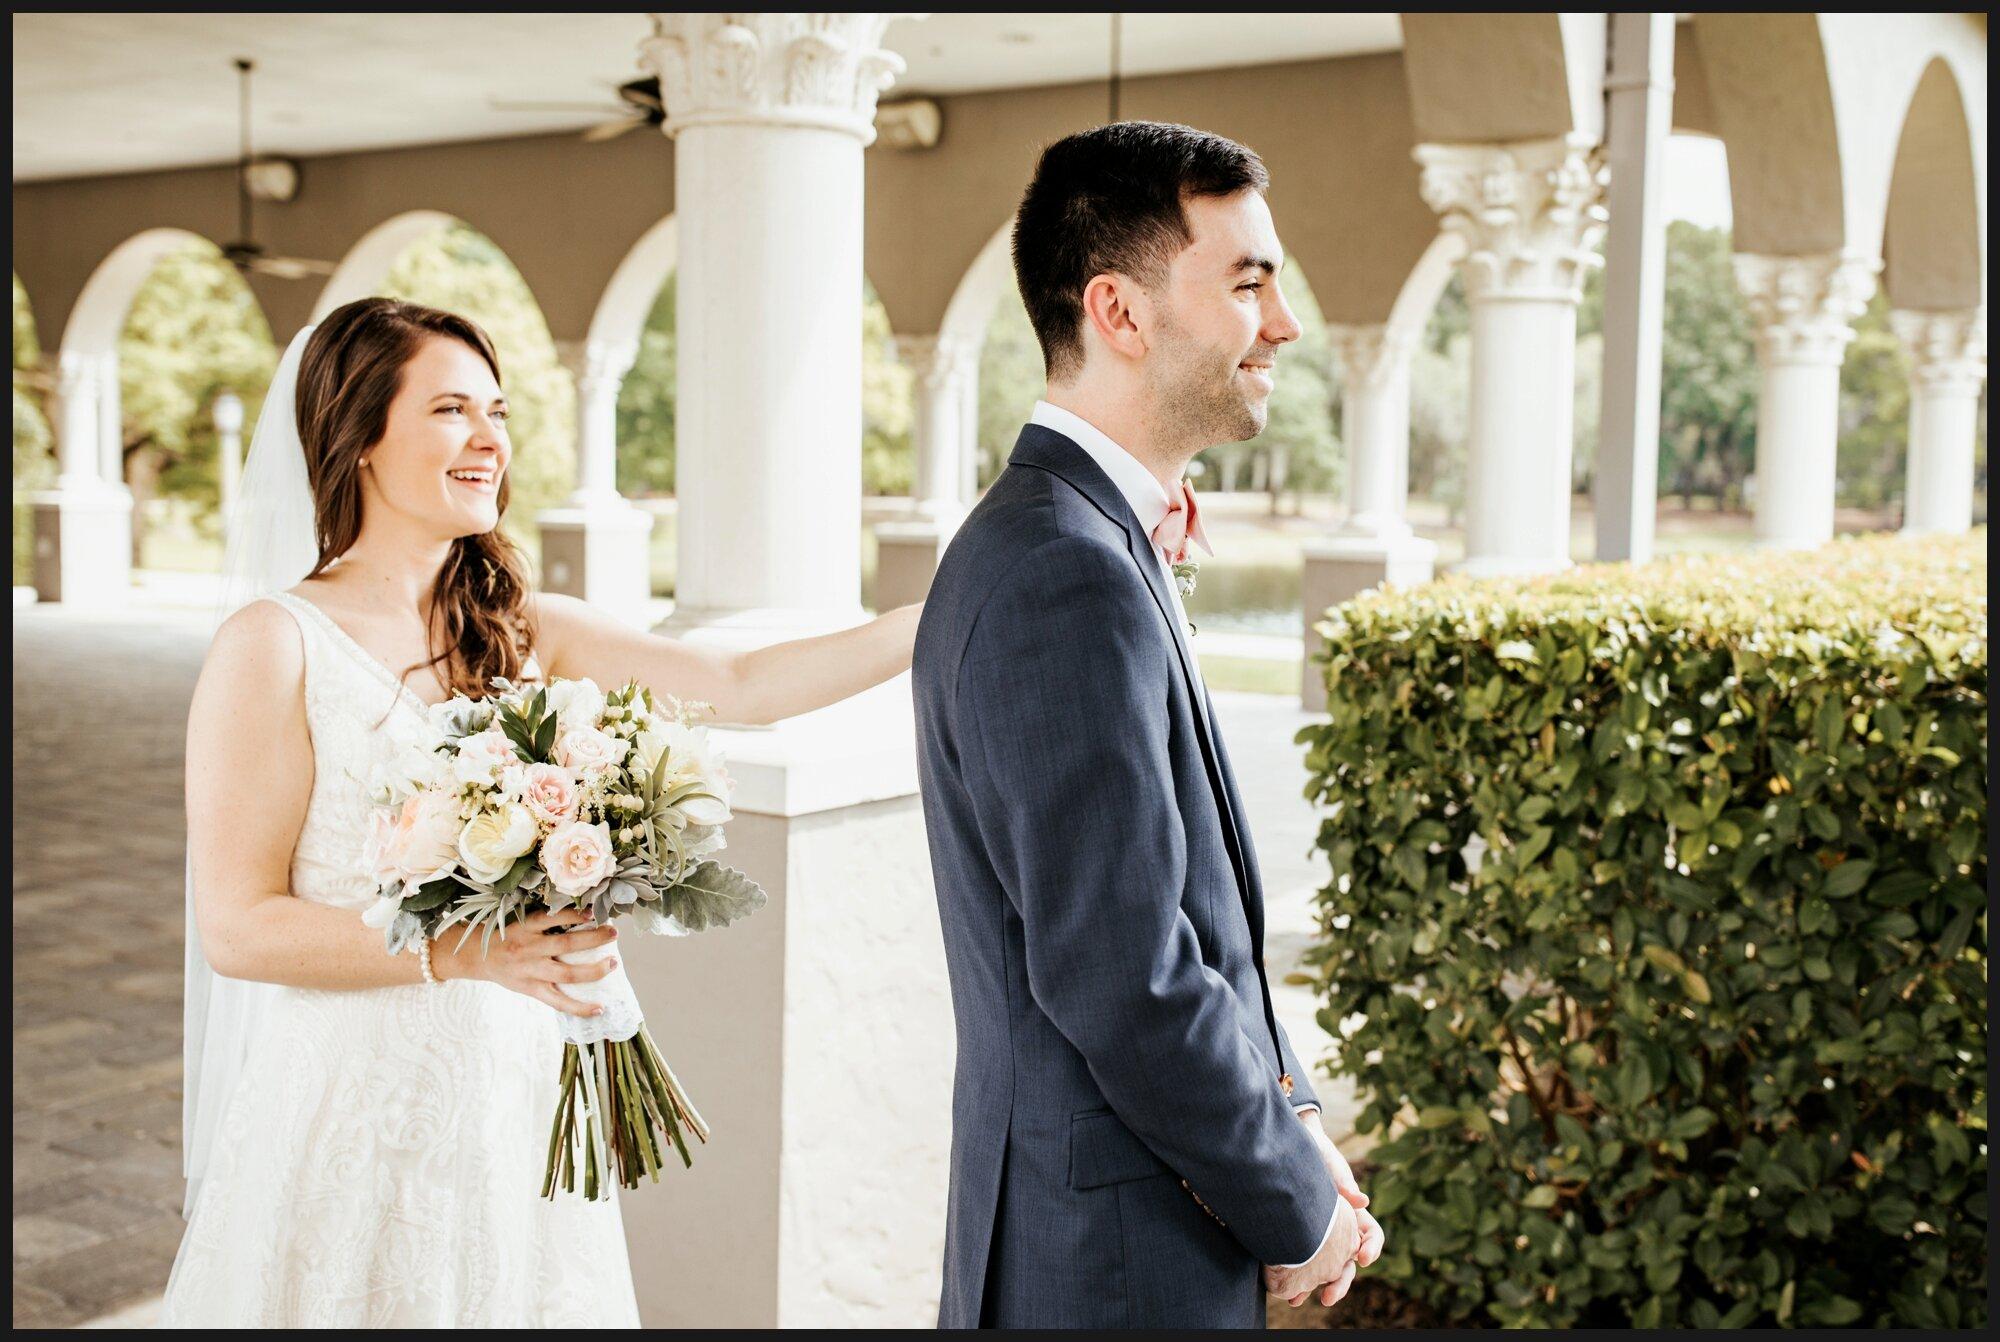 Orlando-Wedding-Photographer-destination-wedding-photographer-florida-wedding-photographer-hawaii-wedding-photographer_0663.jpg